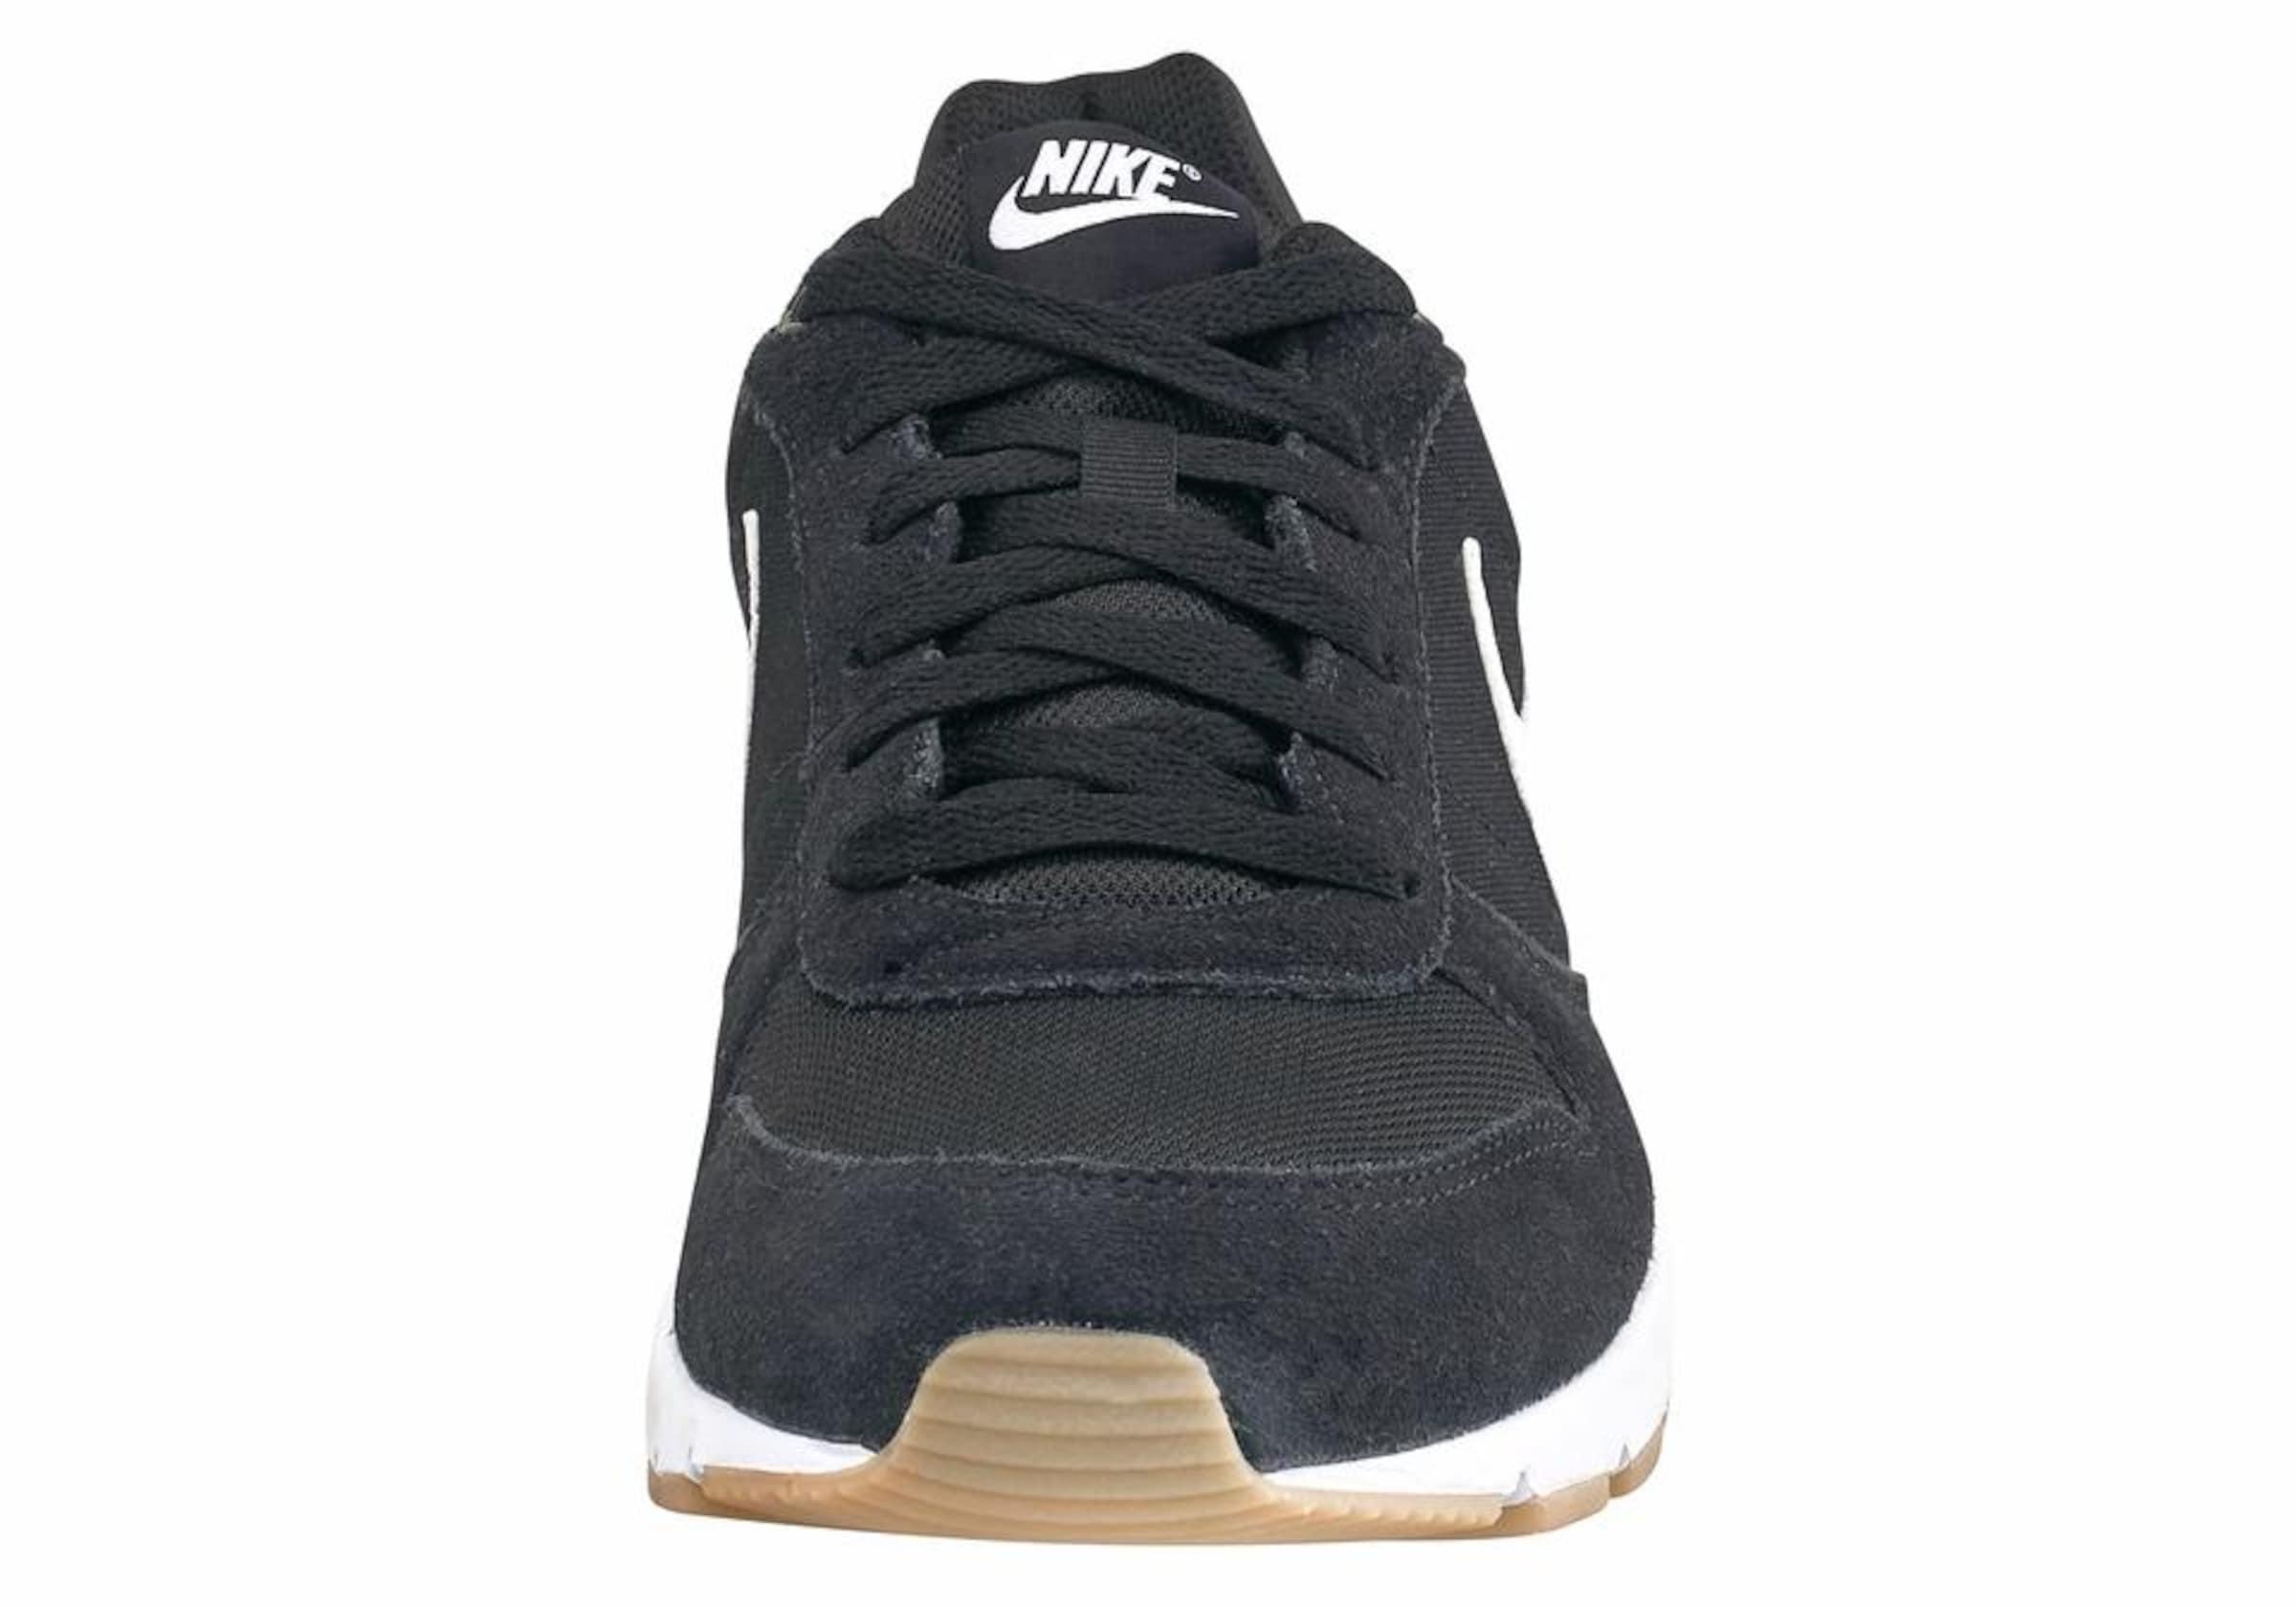 Sneaker SchwarzWeiß Nike Sportswear In 'nightgazer' thQCxdorBs